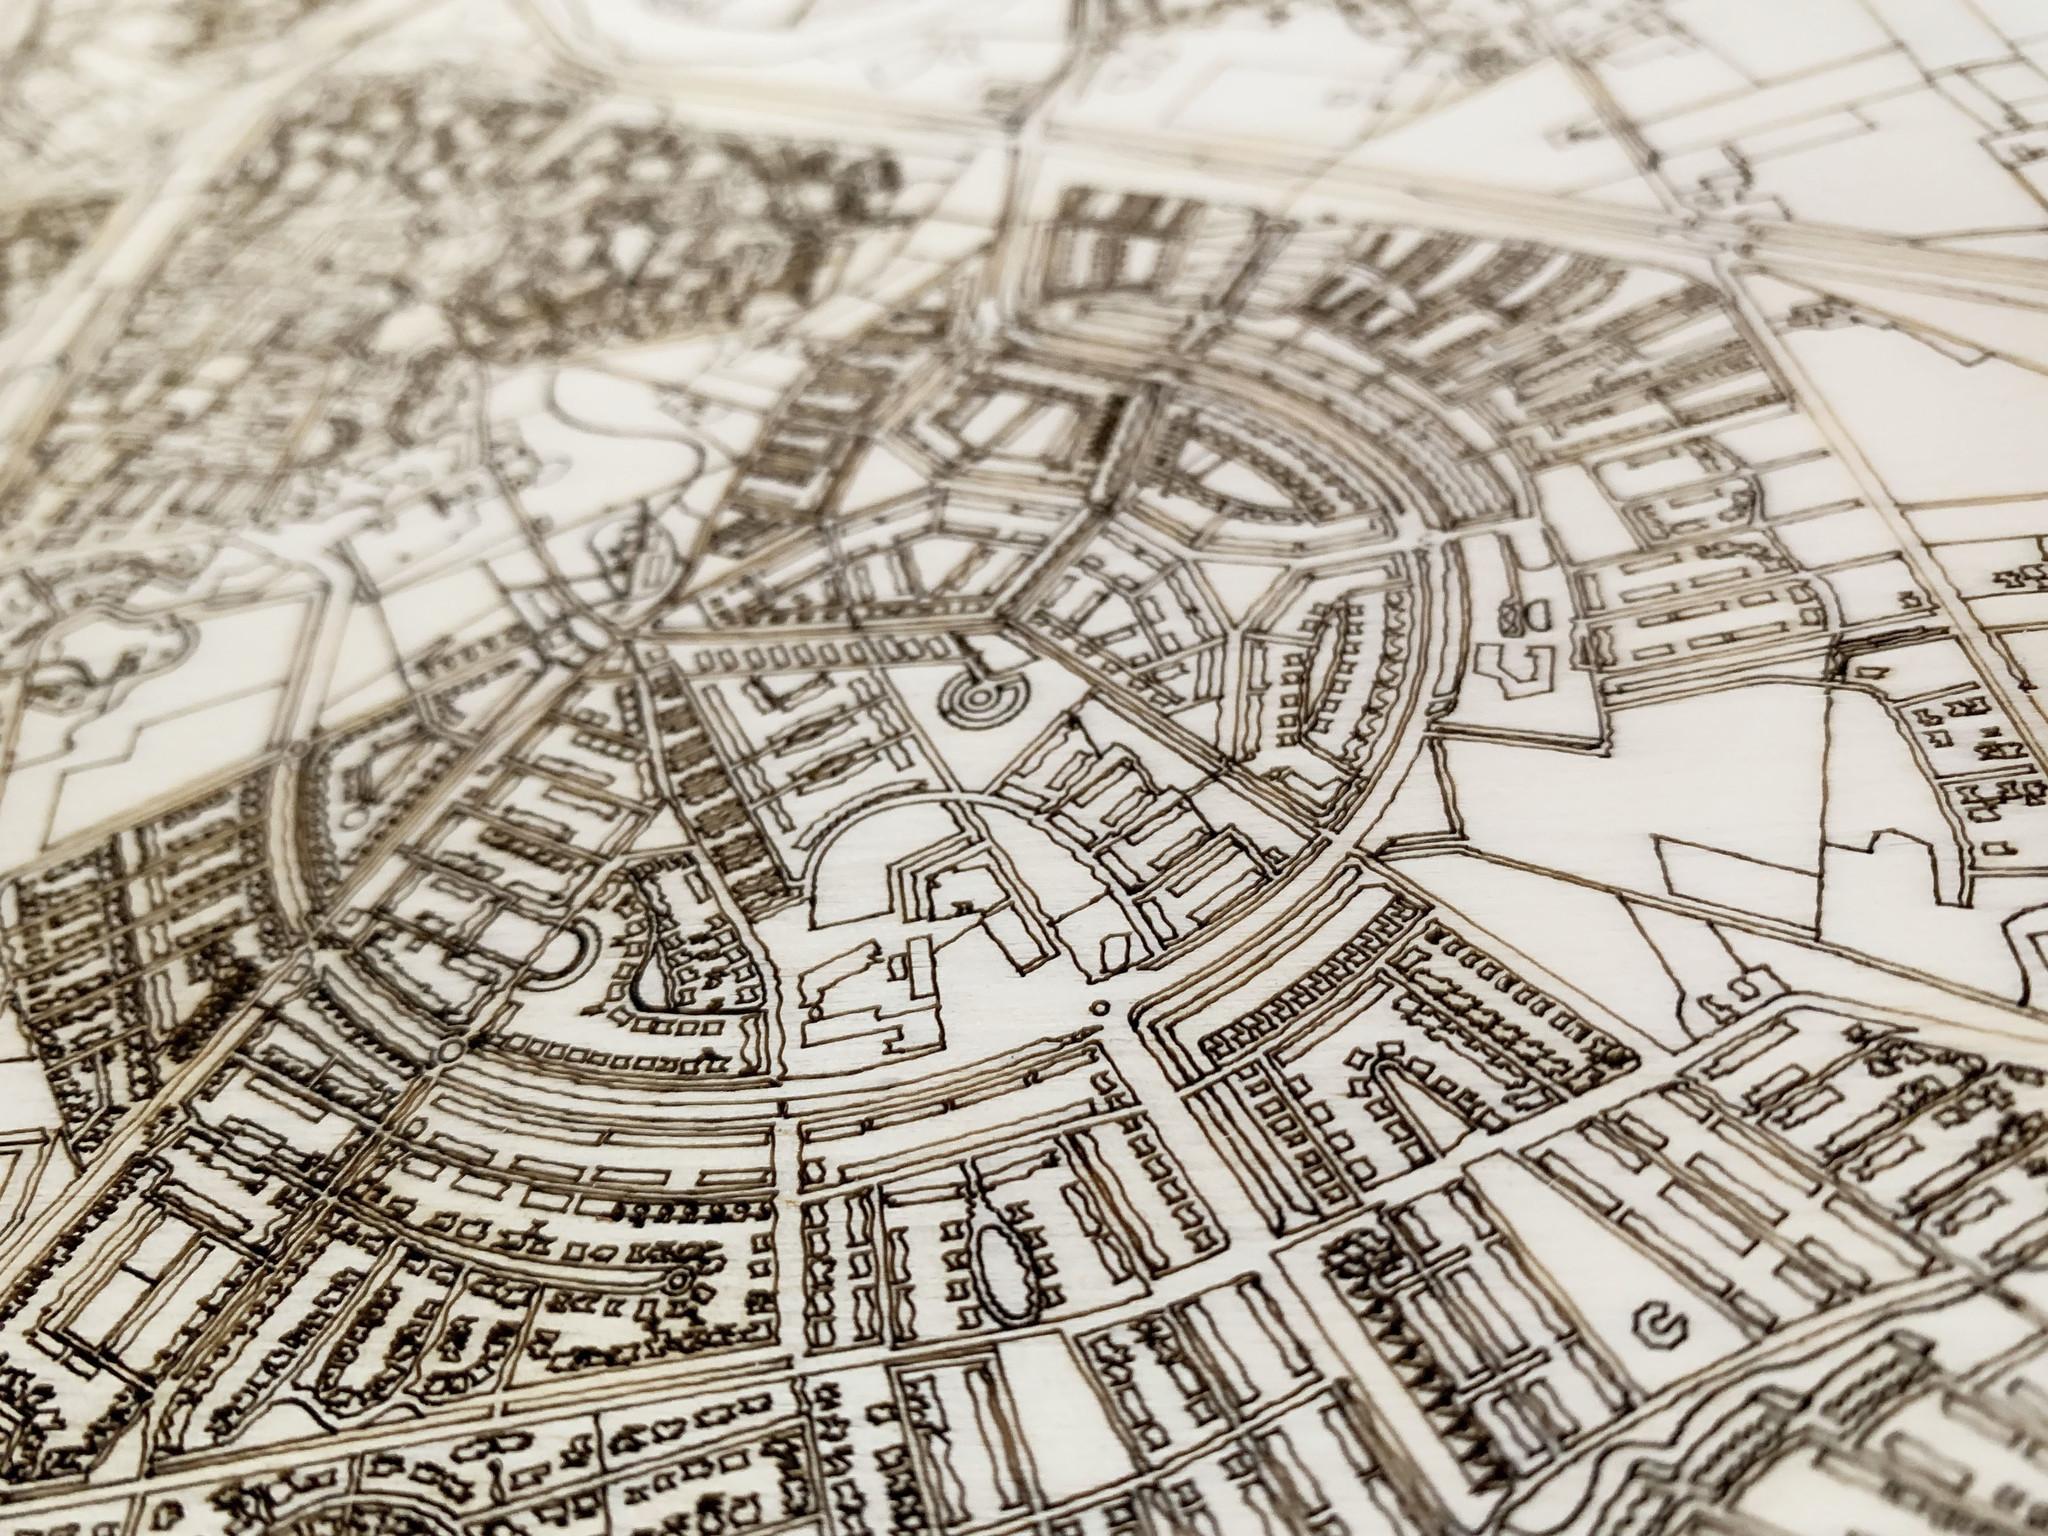 Houten stadsplattegrond Sevilla-3